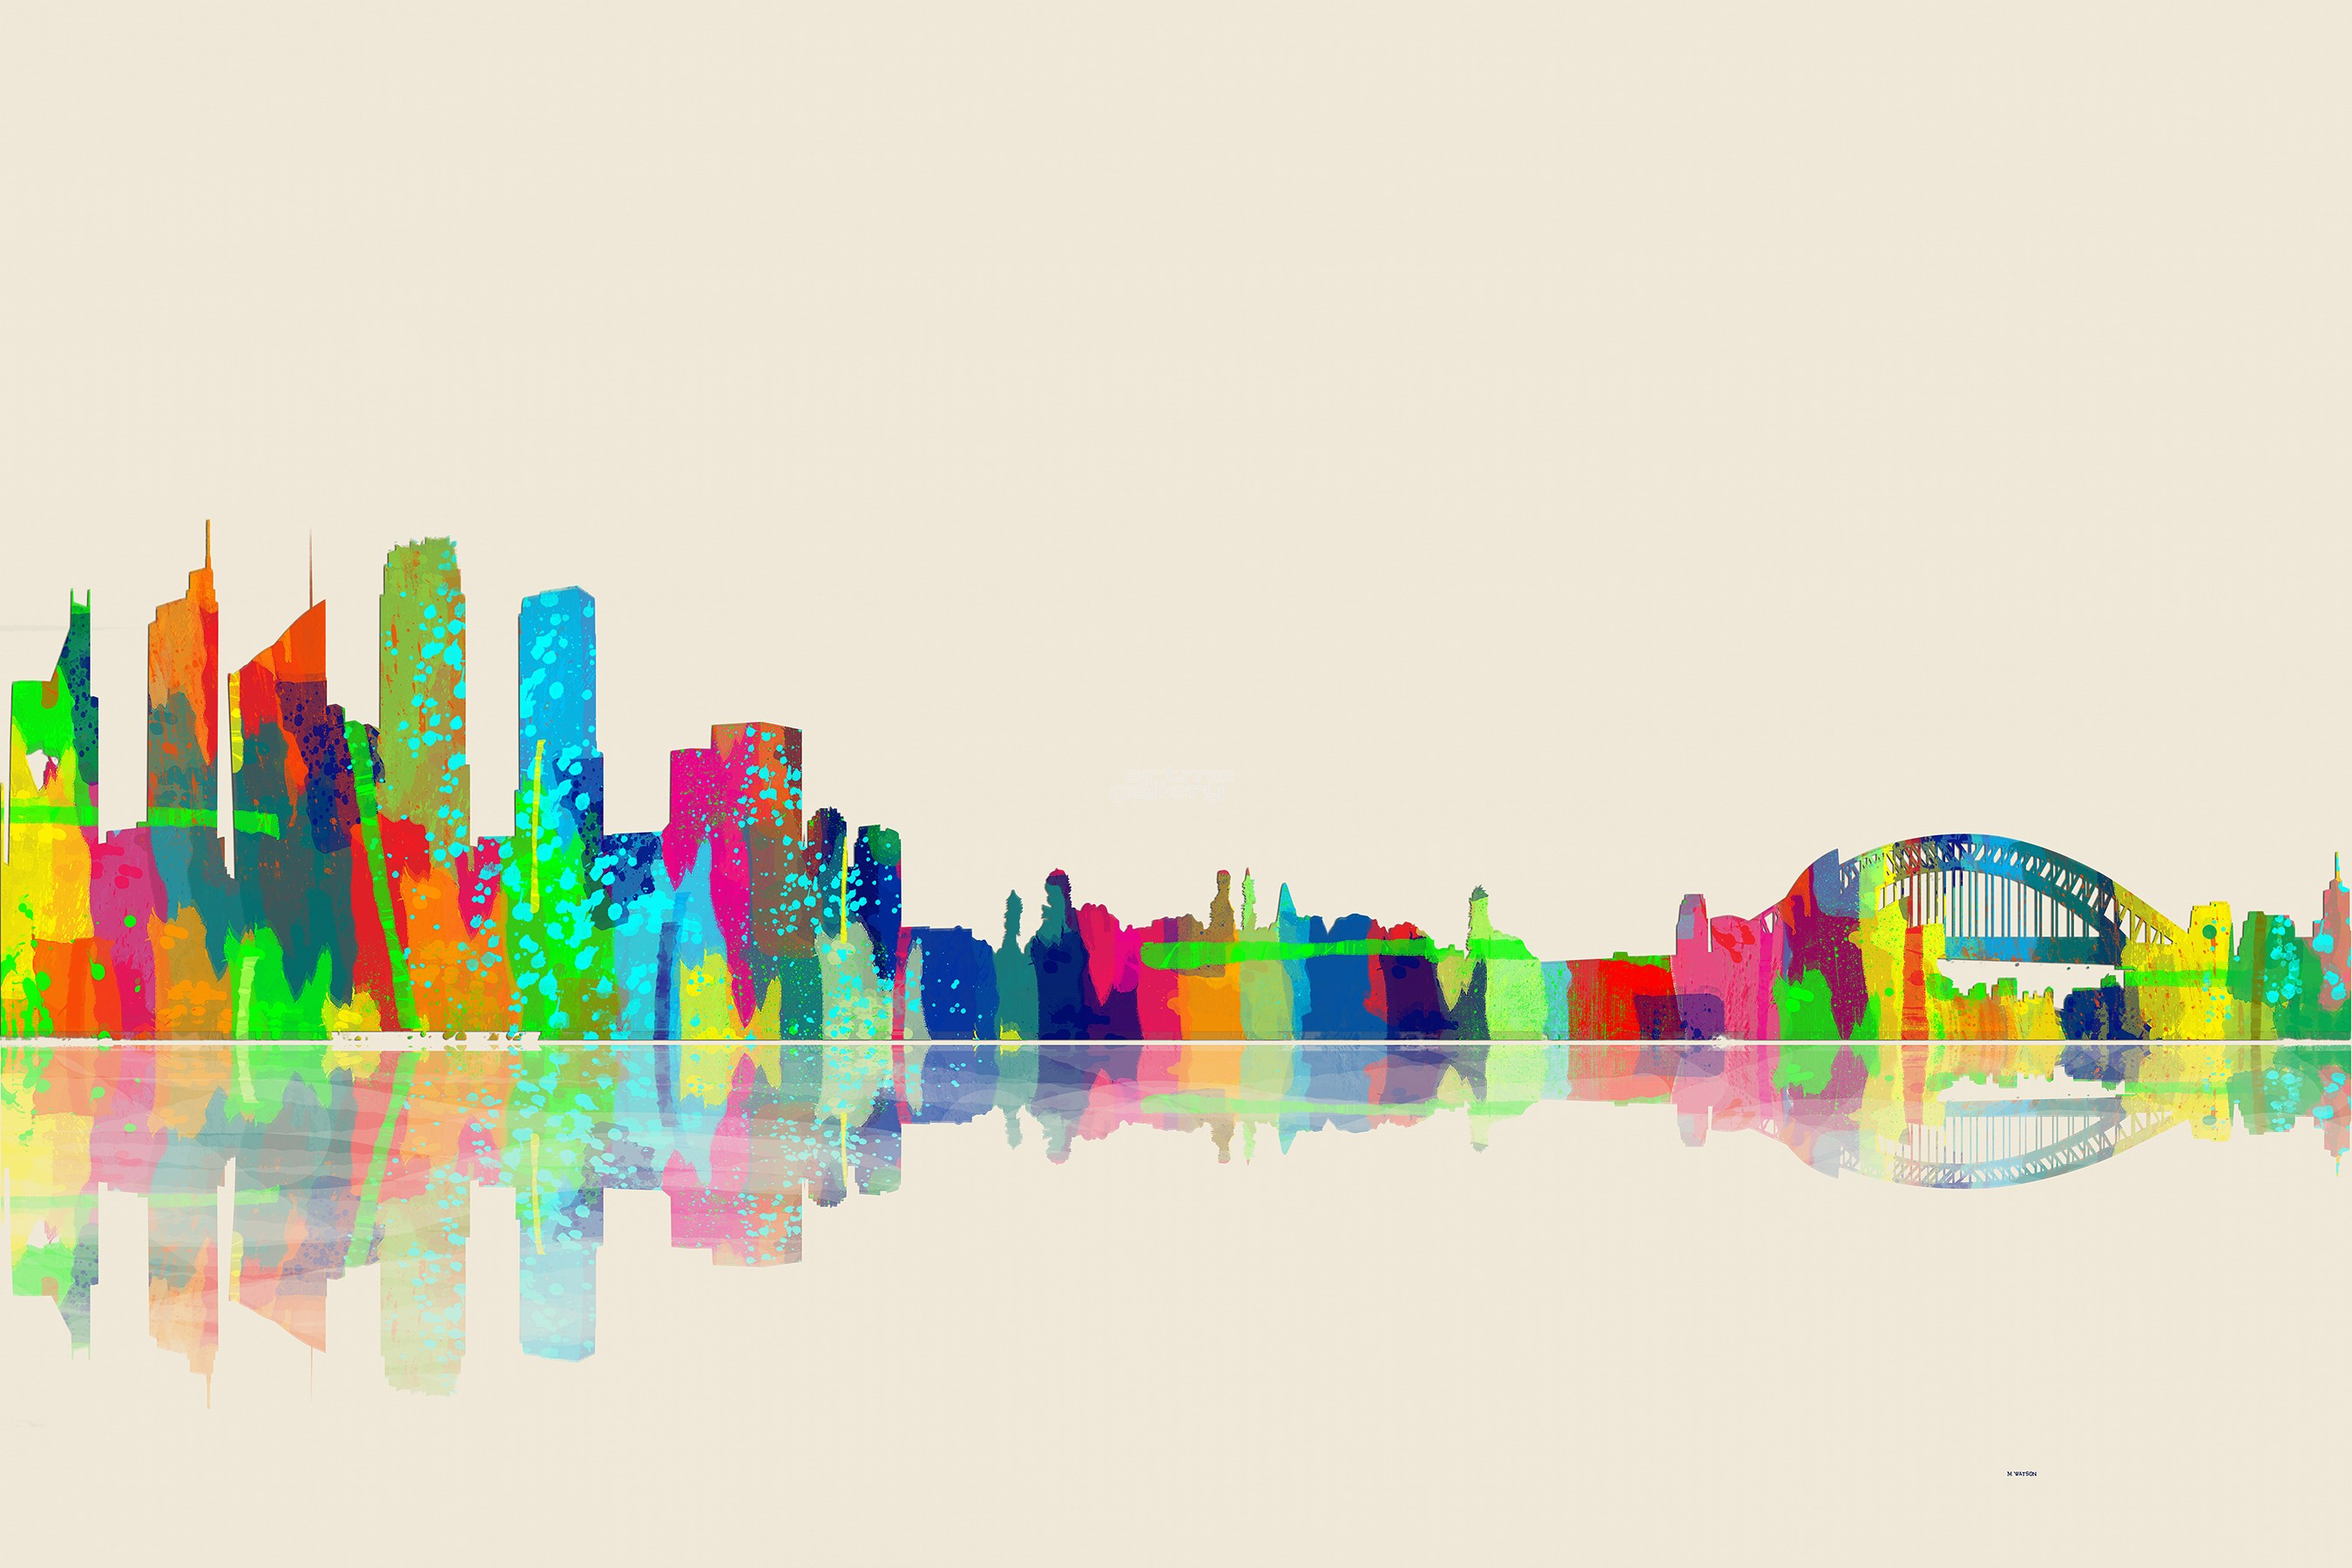 Drawn skyline pop art Free Online on – Gallery